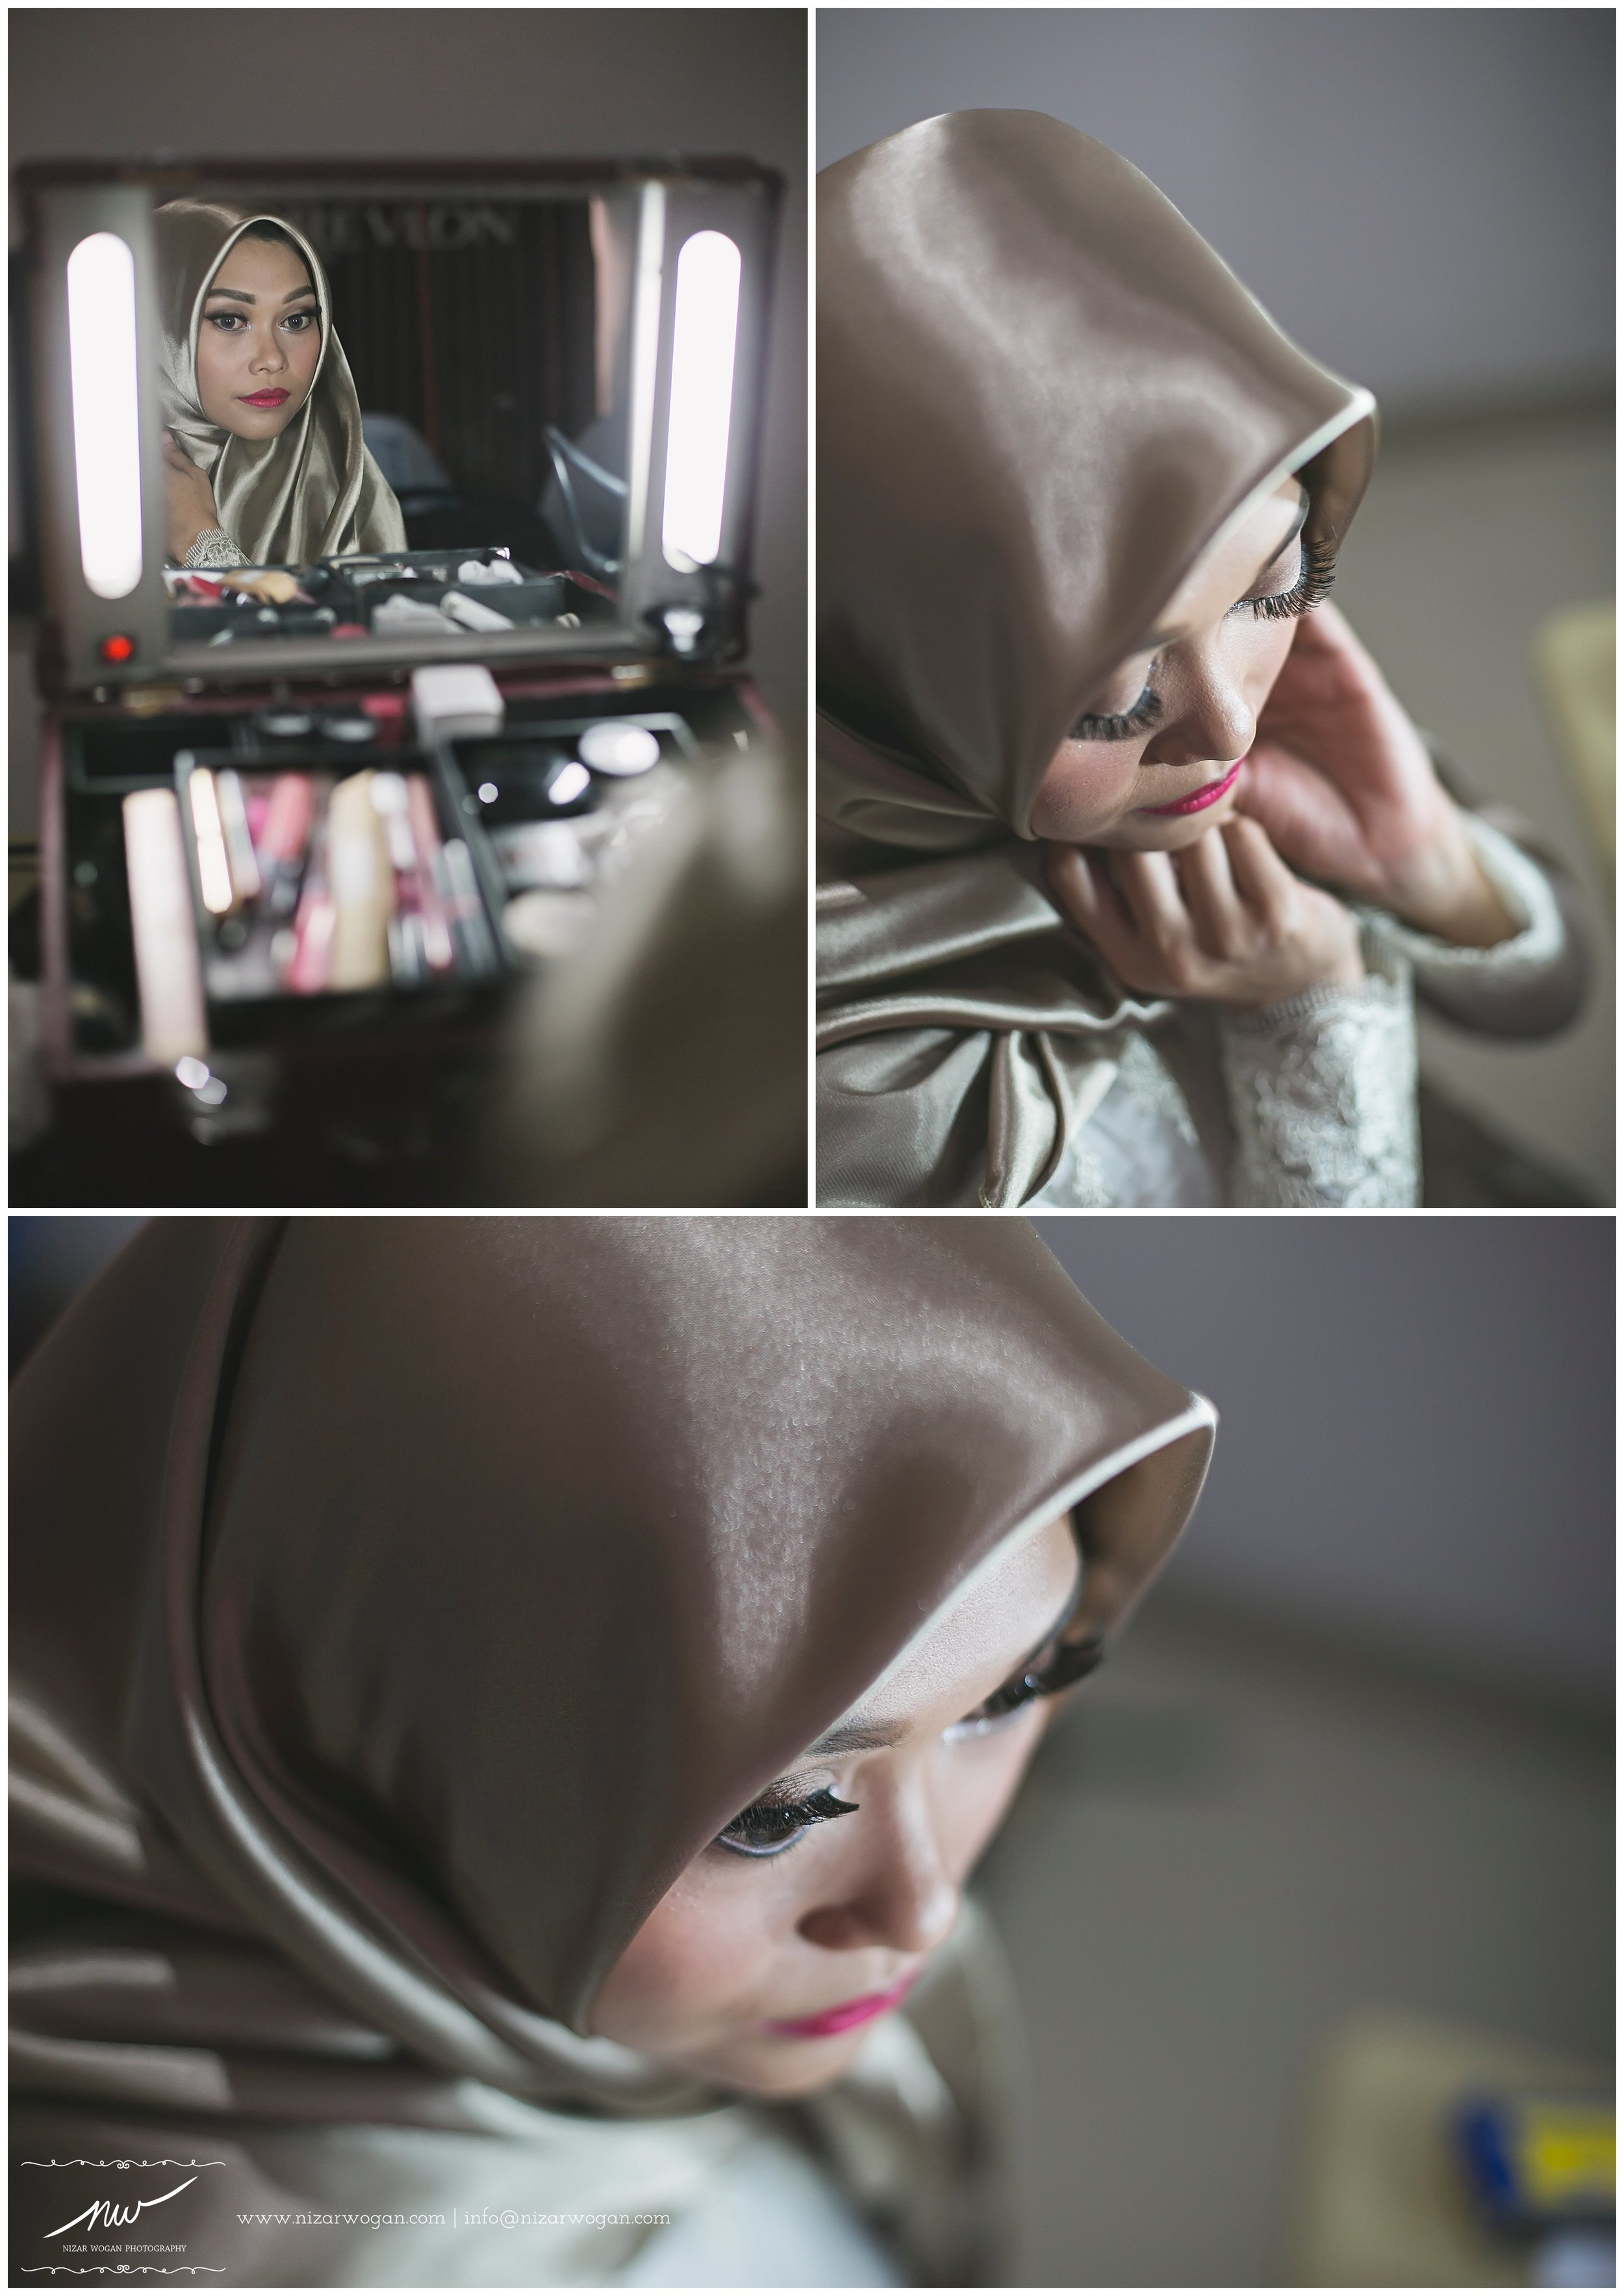 Loving the make up!